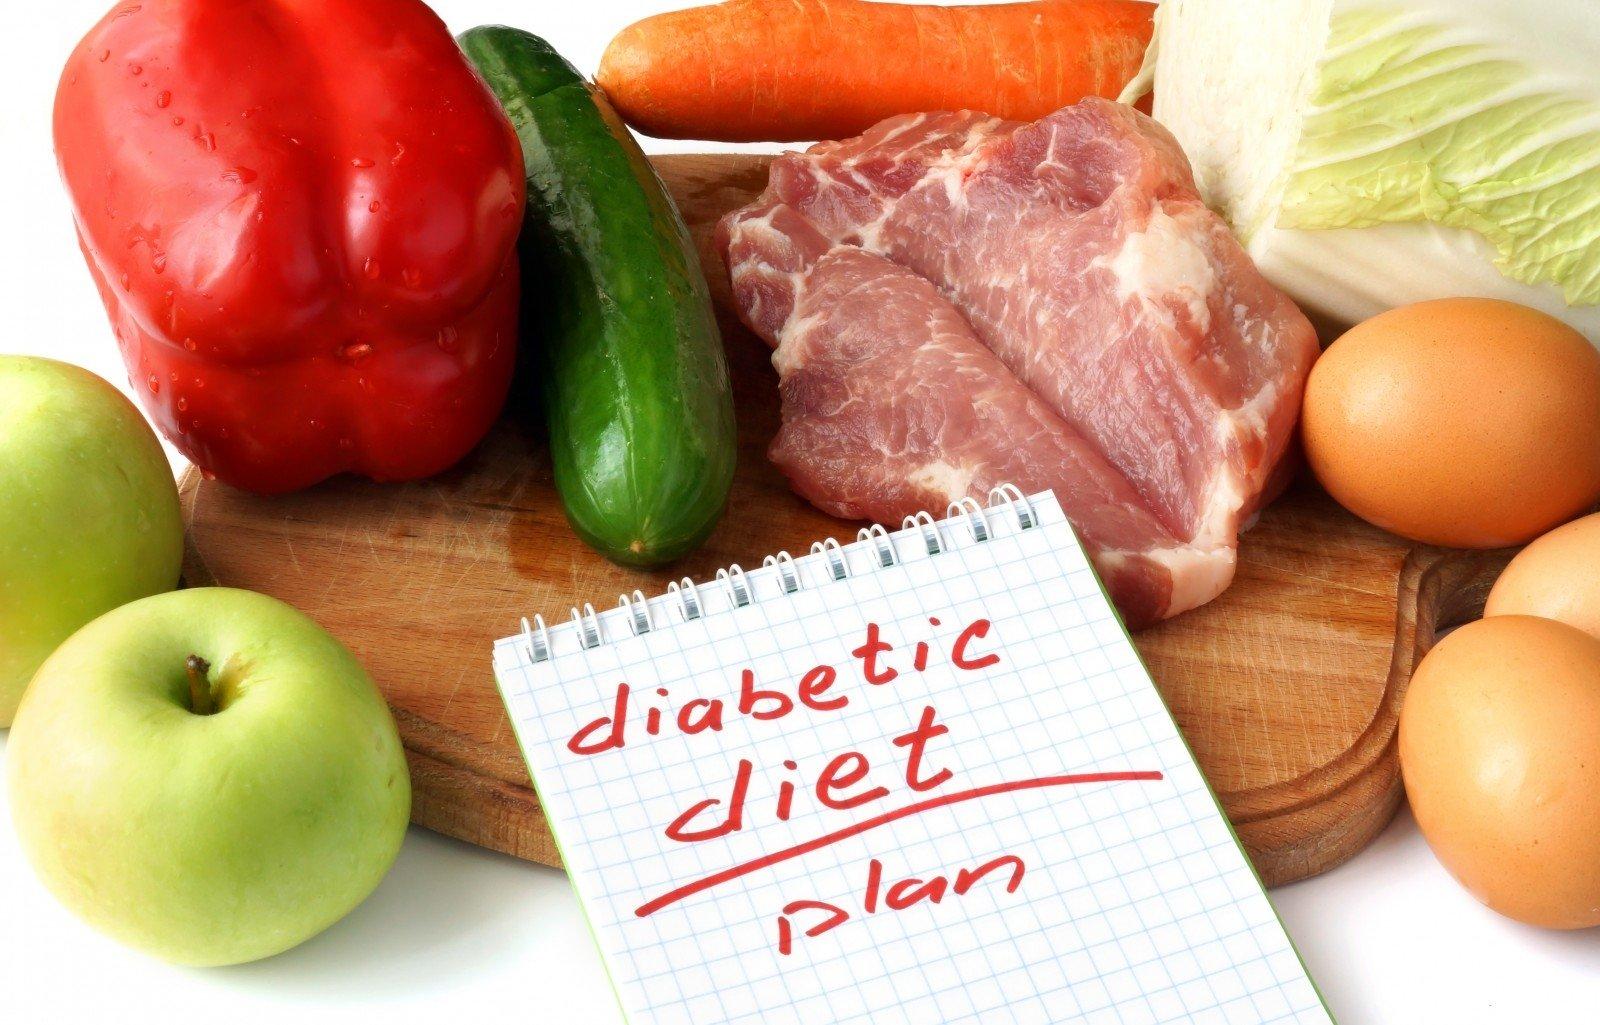 Arterinė hipertenzija sergant cukriniu diabetu